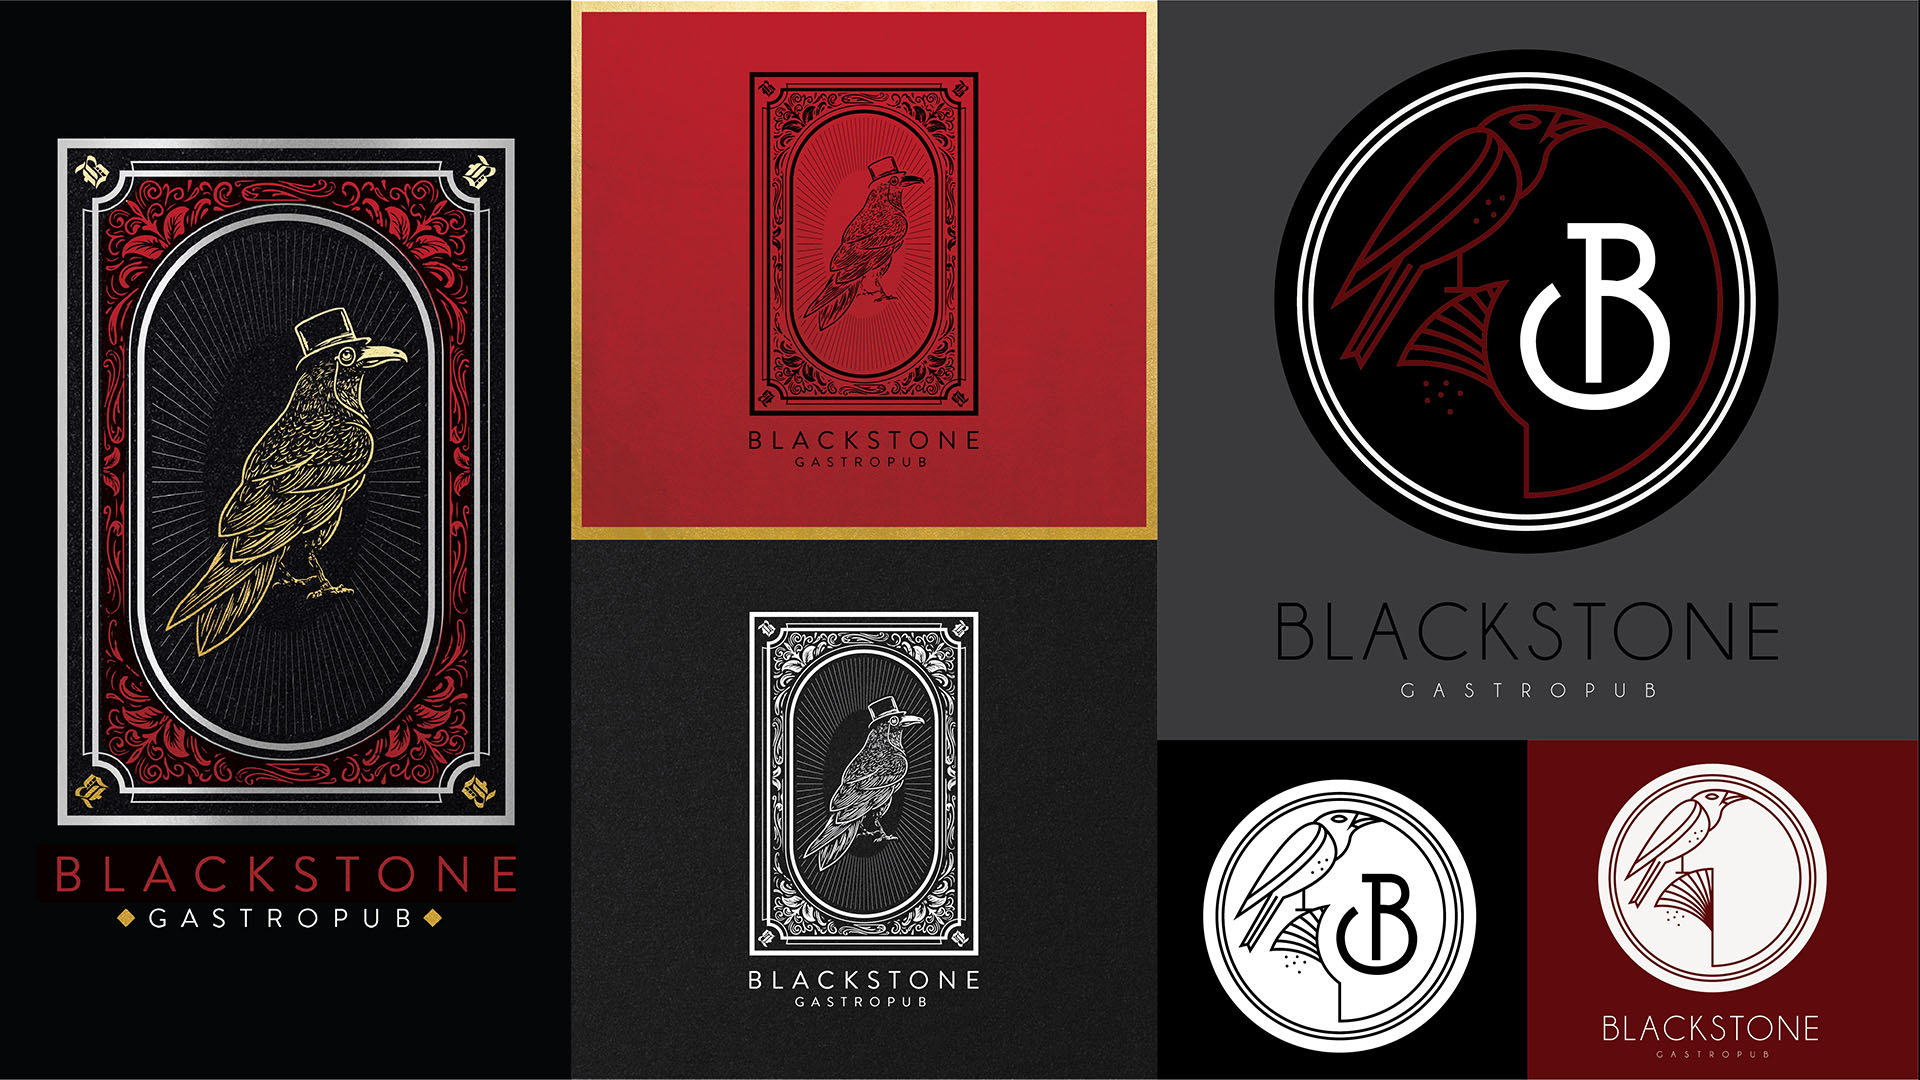 Blackstone Gastropub Brand Development Identity Design